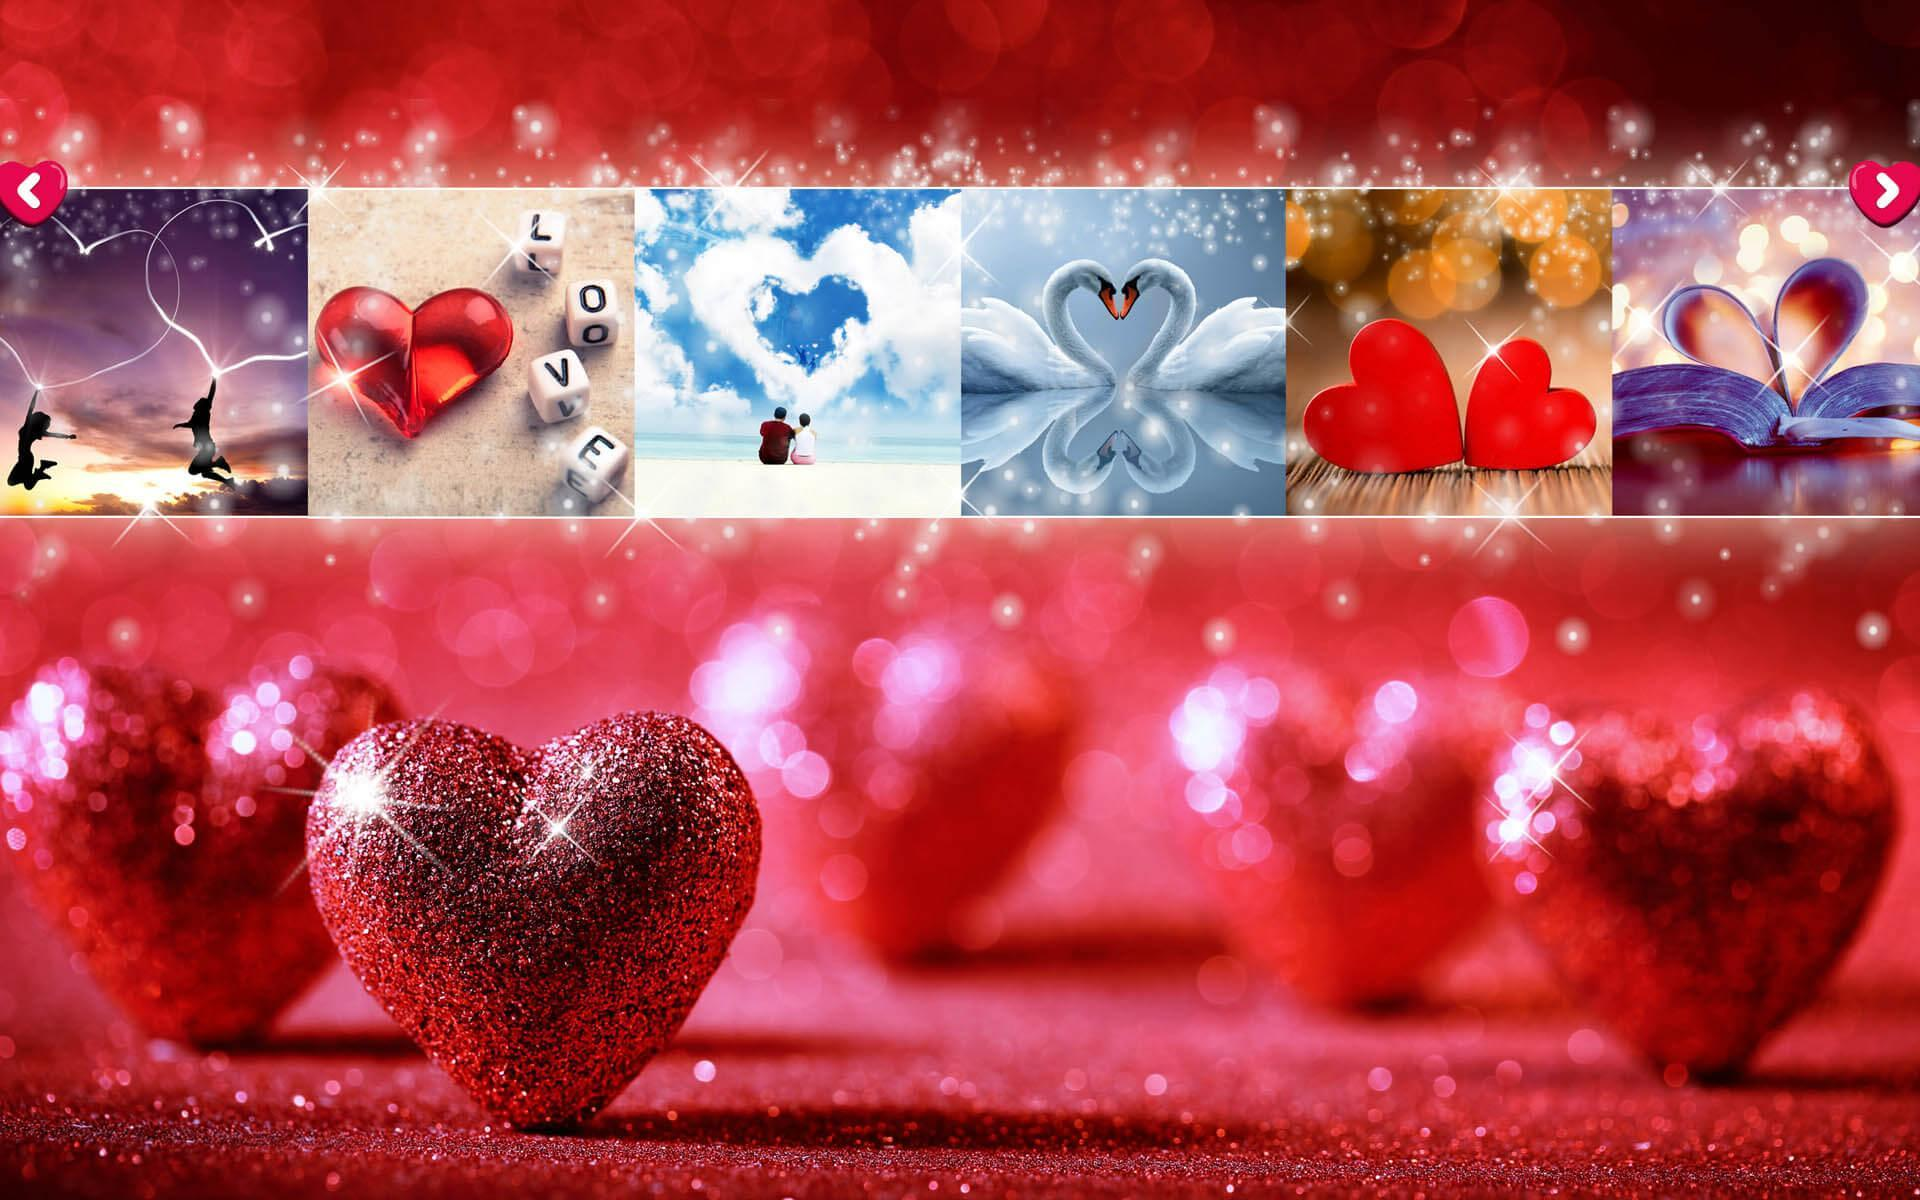 Wallpaper Cinta Romantis Bergerak Gambar Animasi For